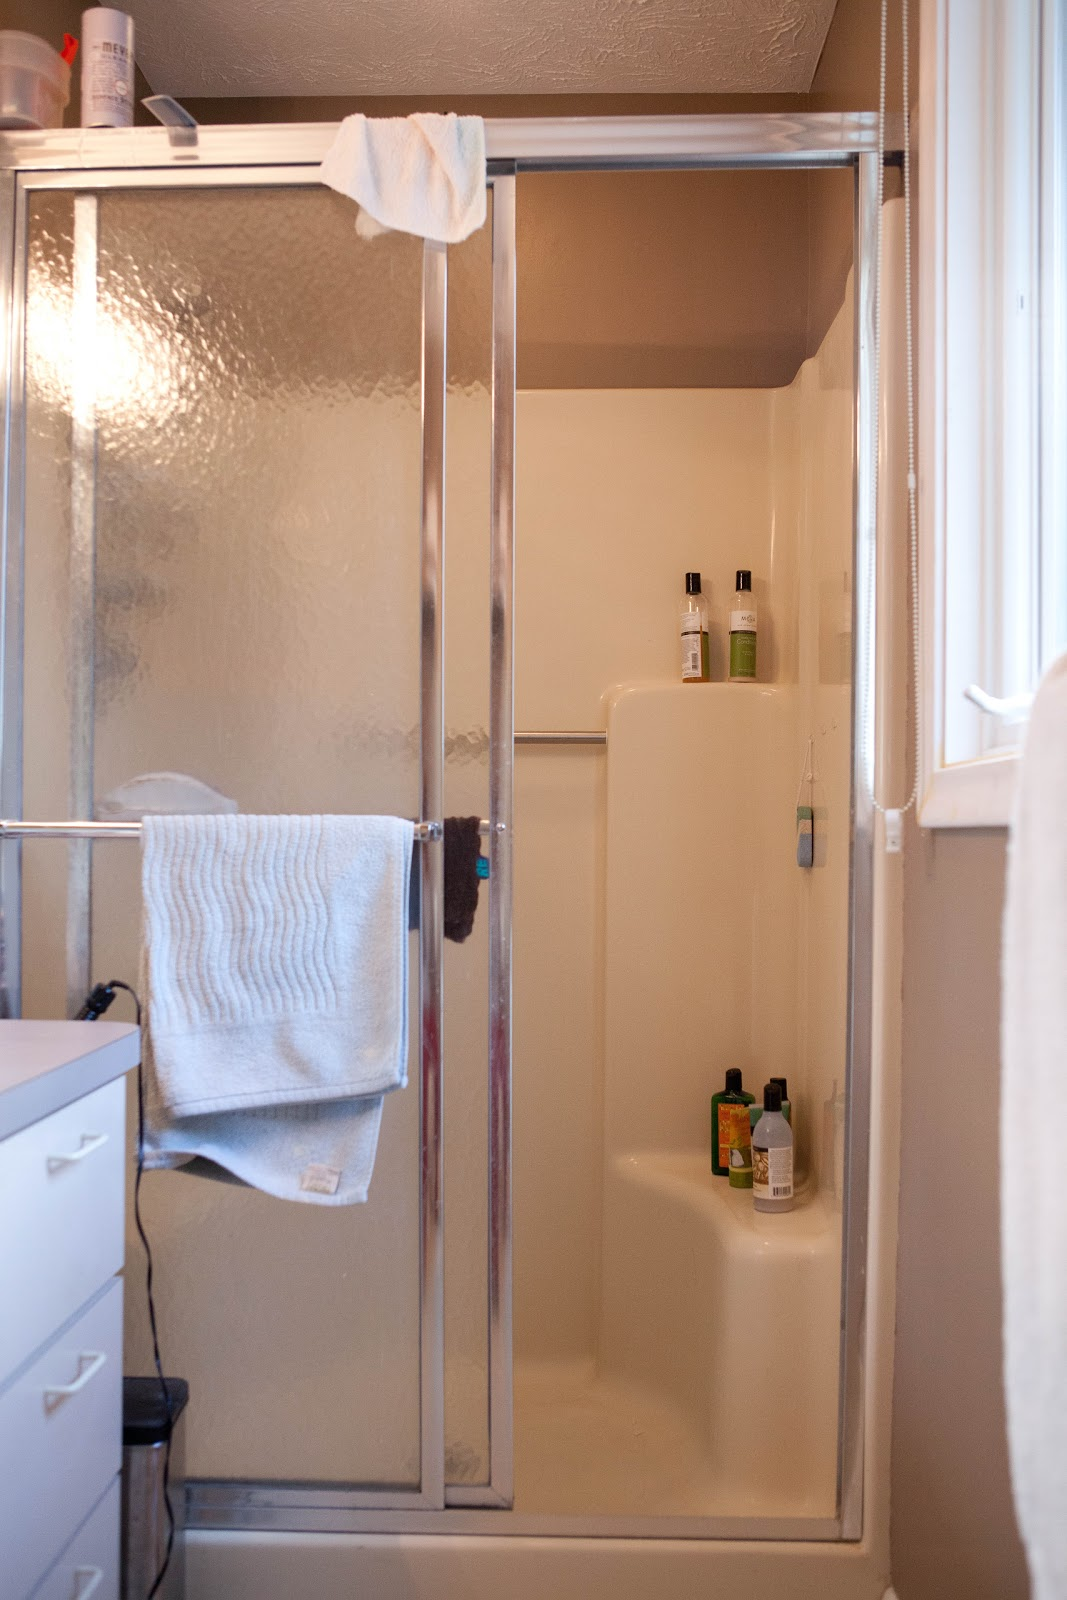 how to clean a very dirty fiberglass bathtub